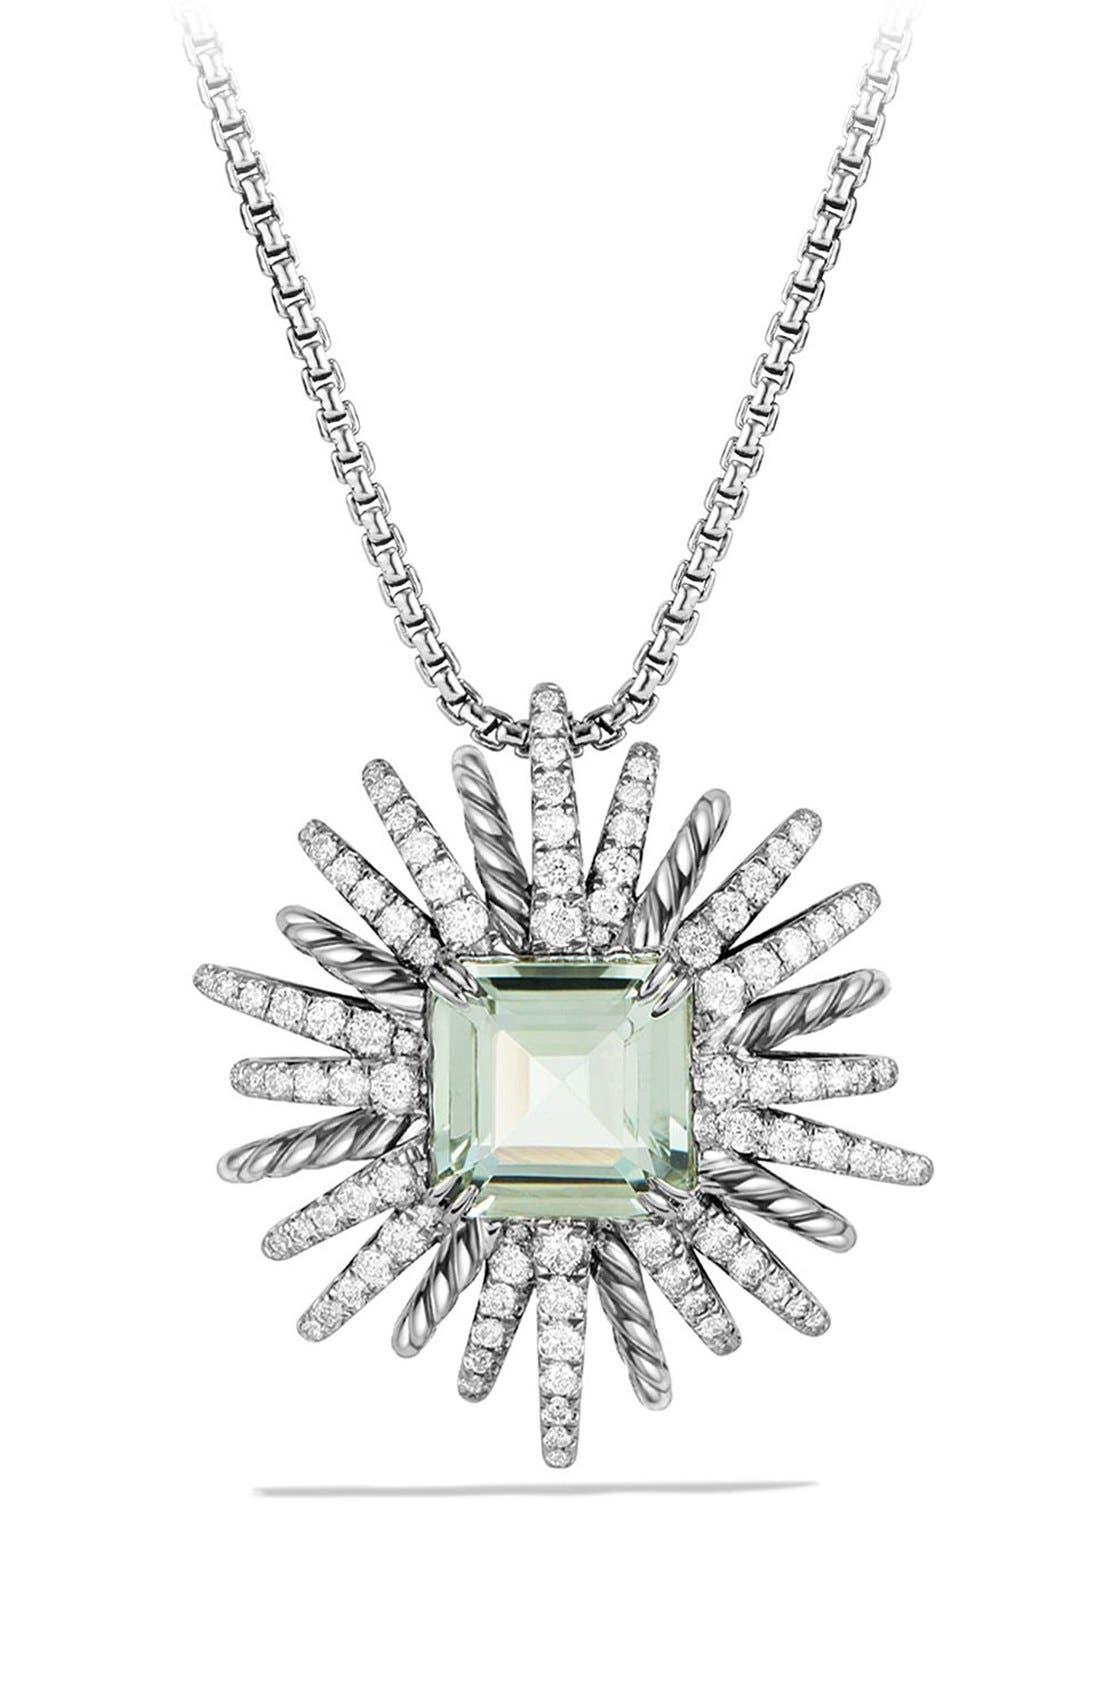 David Yurman 'Starburst' Necklace with Diamonds in Silver